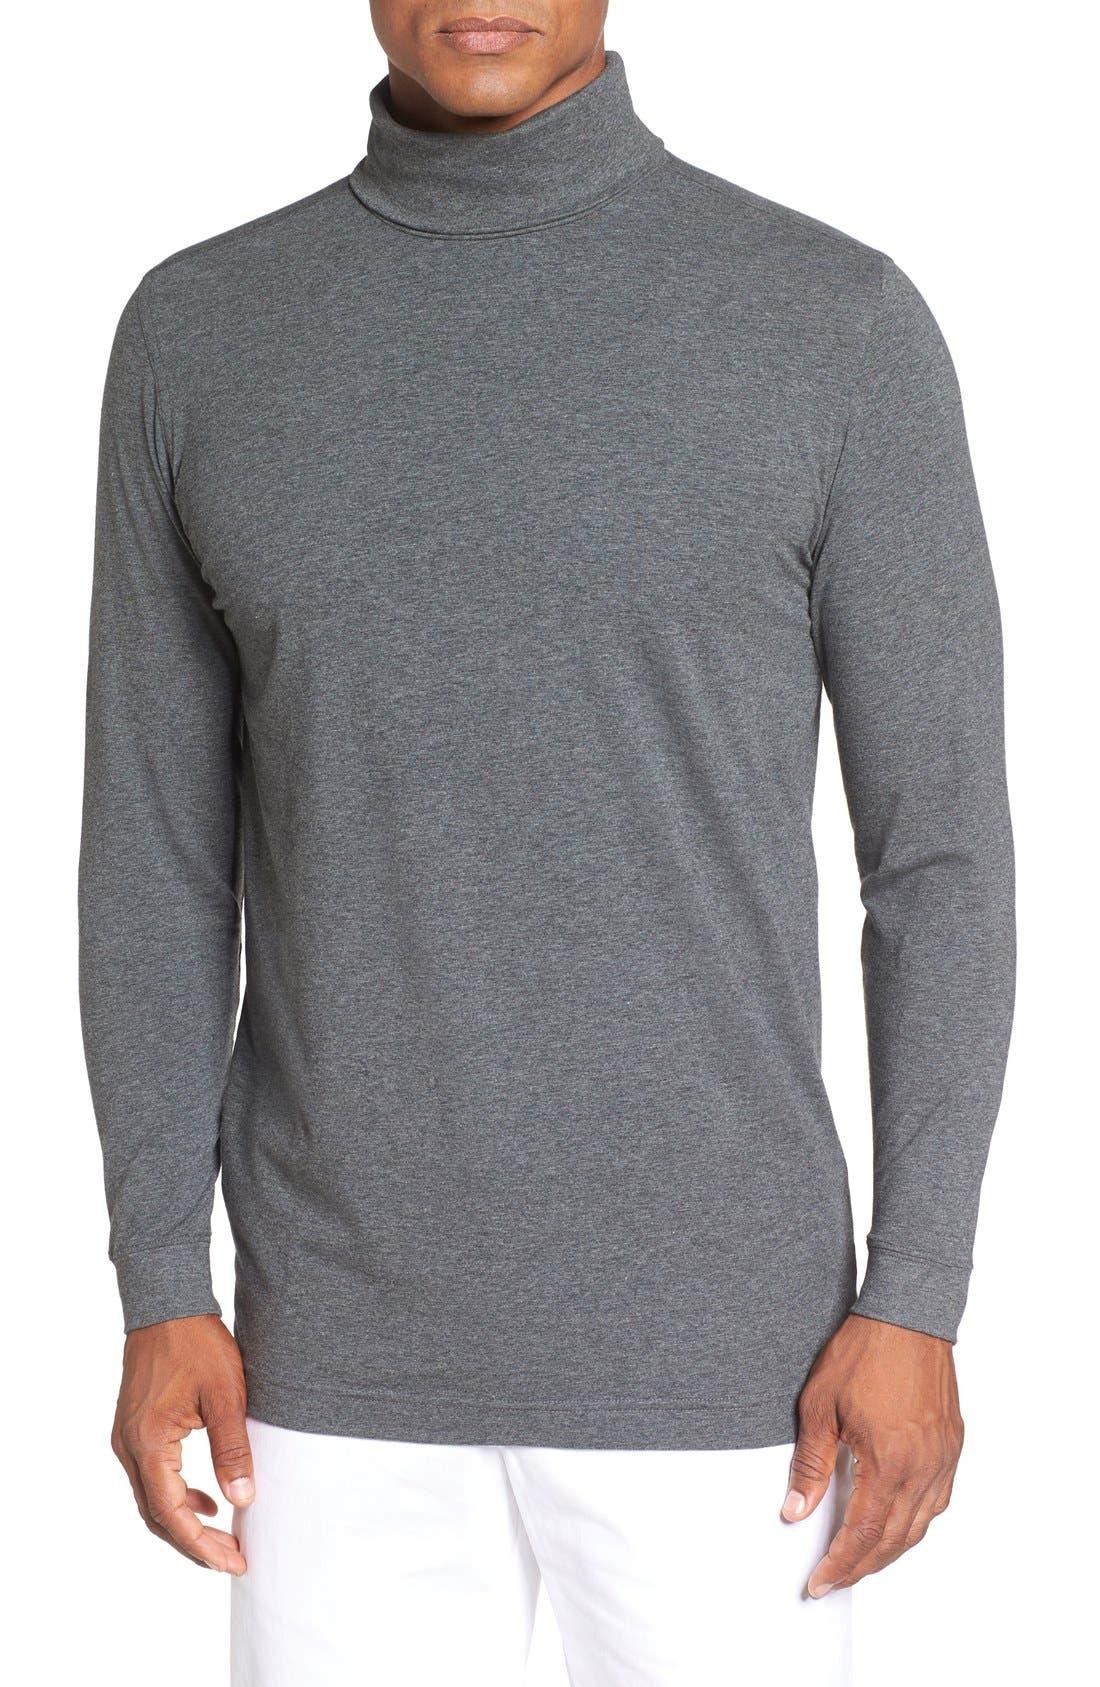 Bobby Jones Long Sleeve Turtleneck T-Shirt